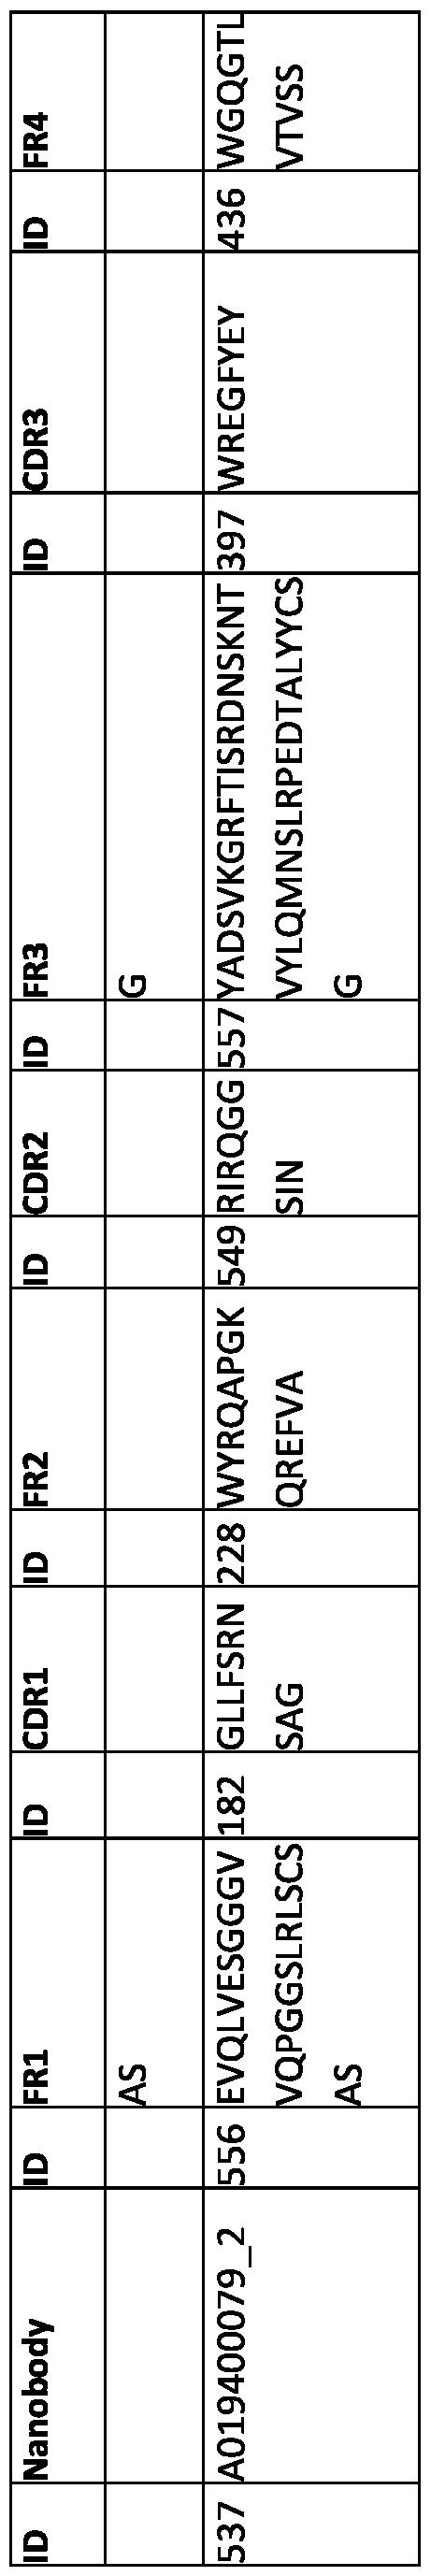 WO2015193452A1 - Kv1 3 binding immunoglobulins - Google Patents